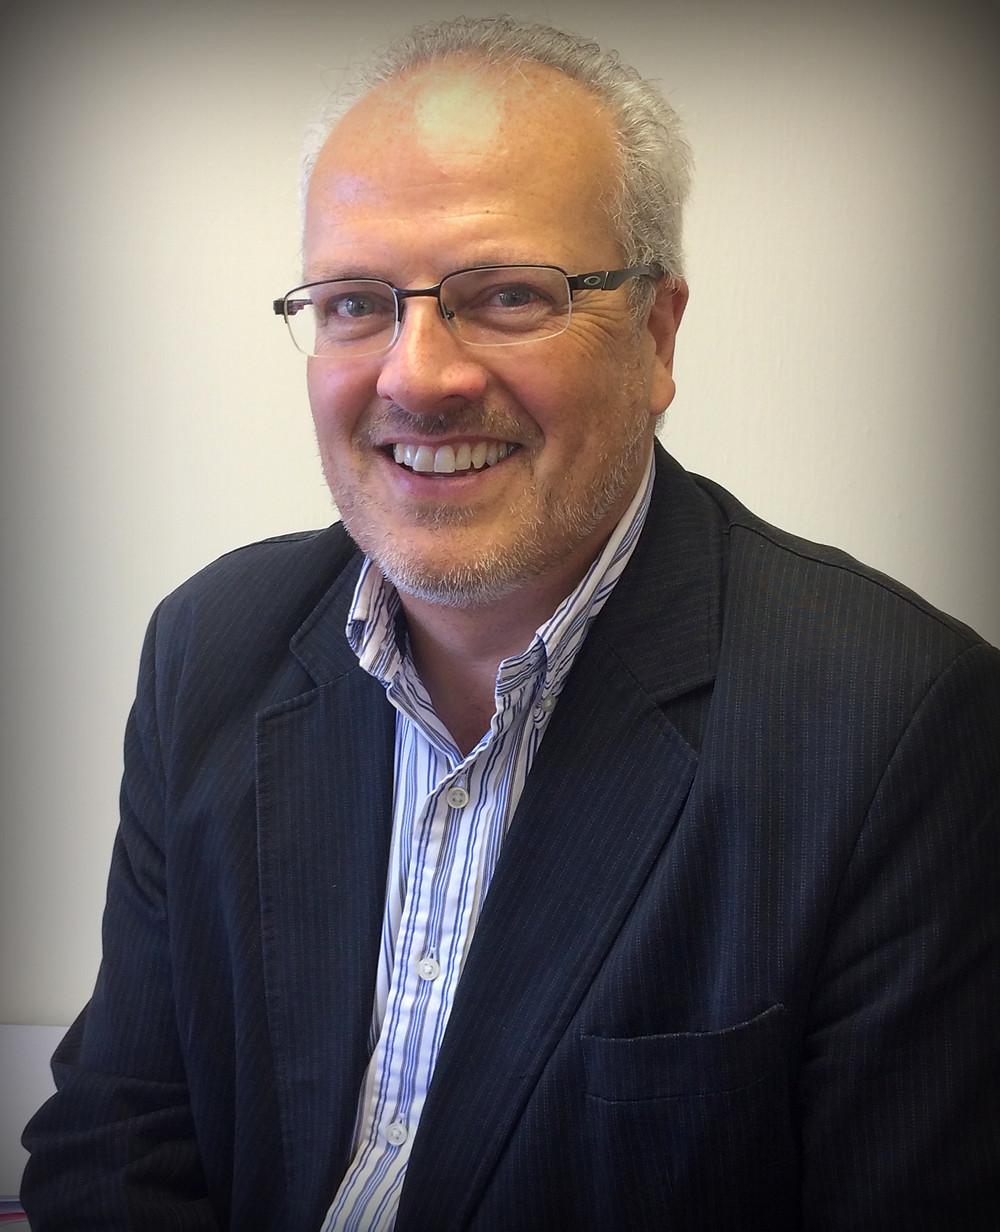 Saul Pitaluga, Managing Director - Colonial Equipment Finance Ltd.